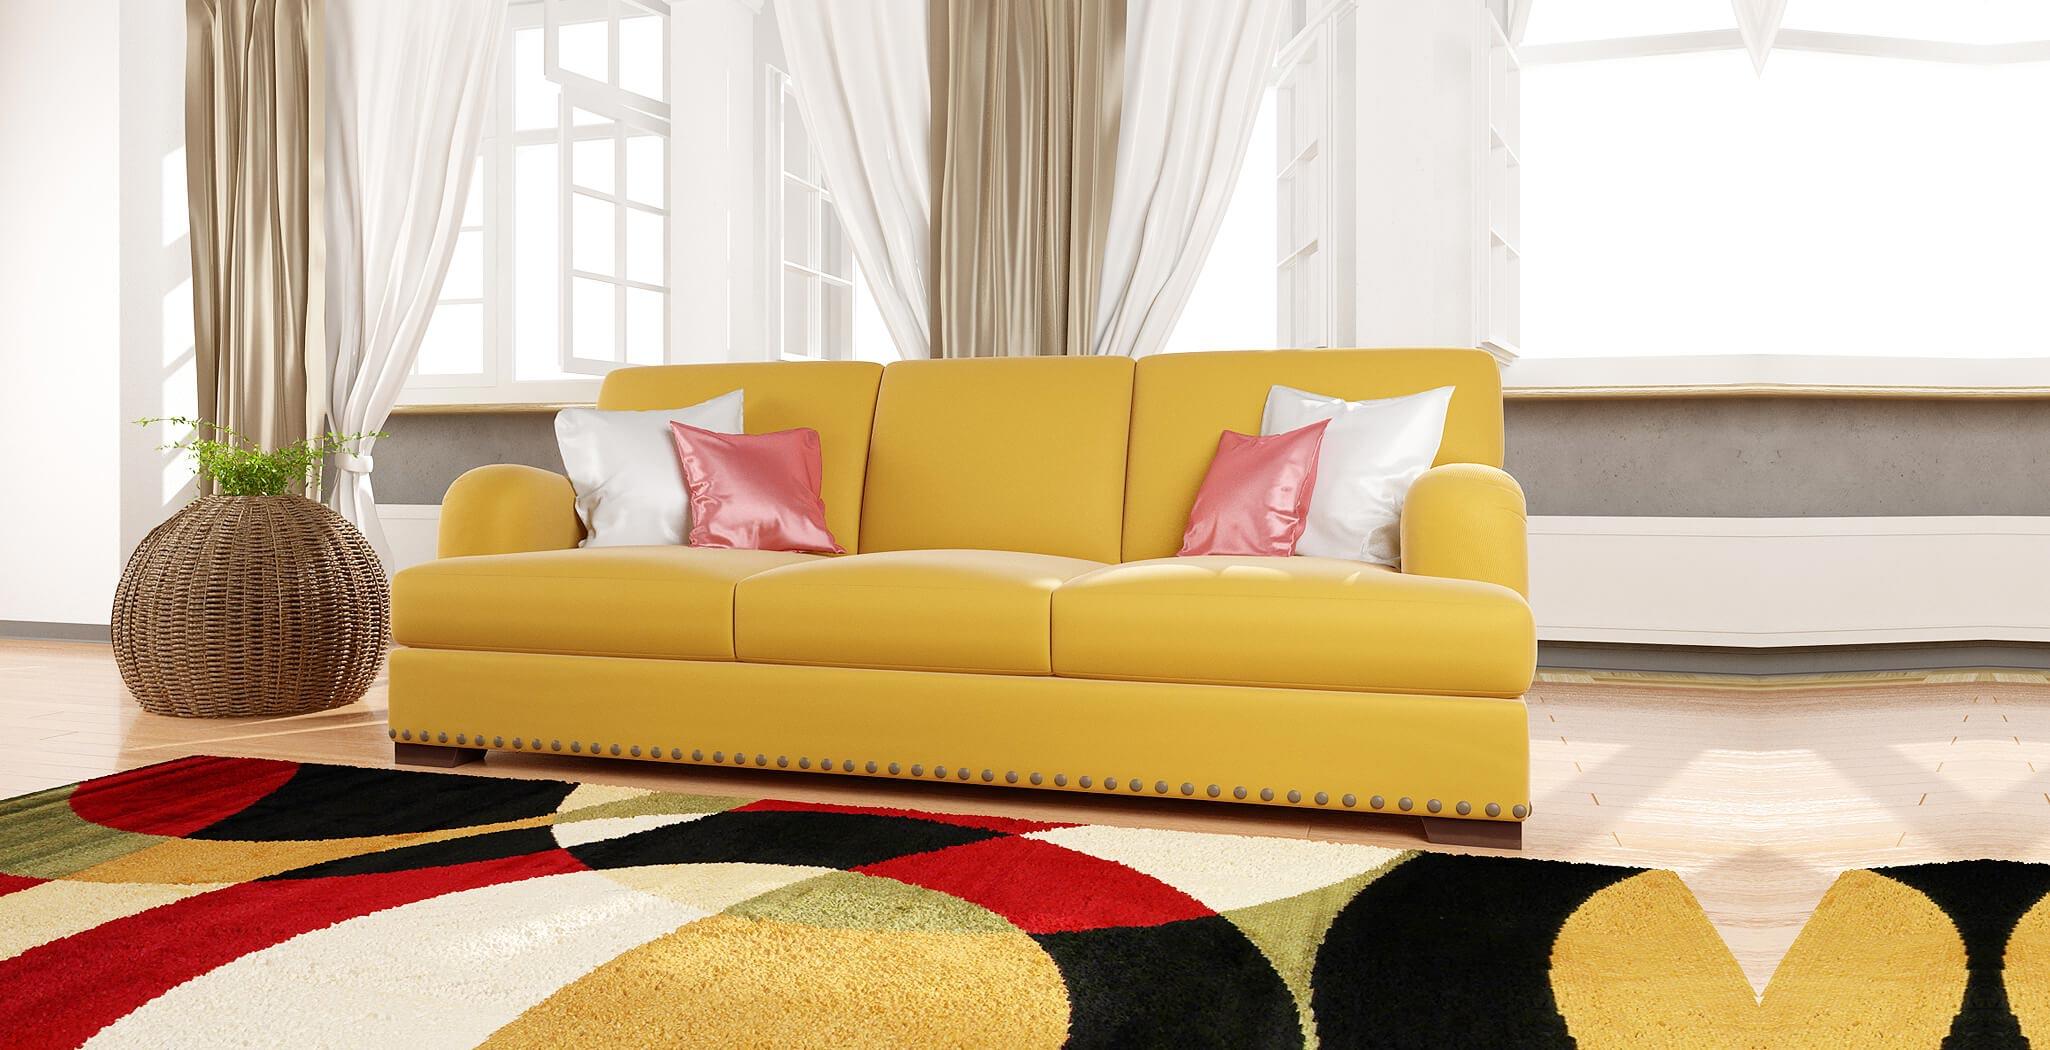 brighton sofa furniture gallery 5